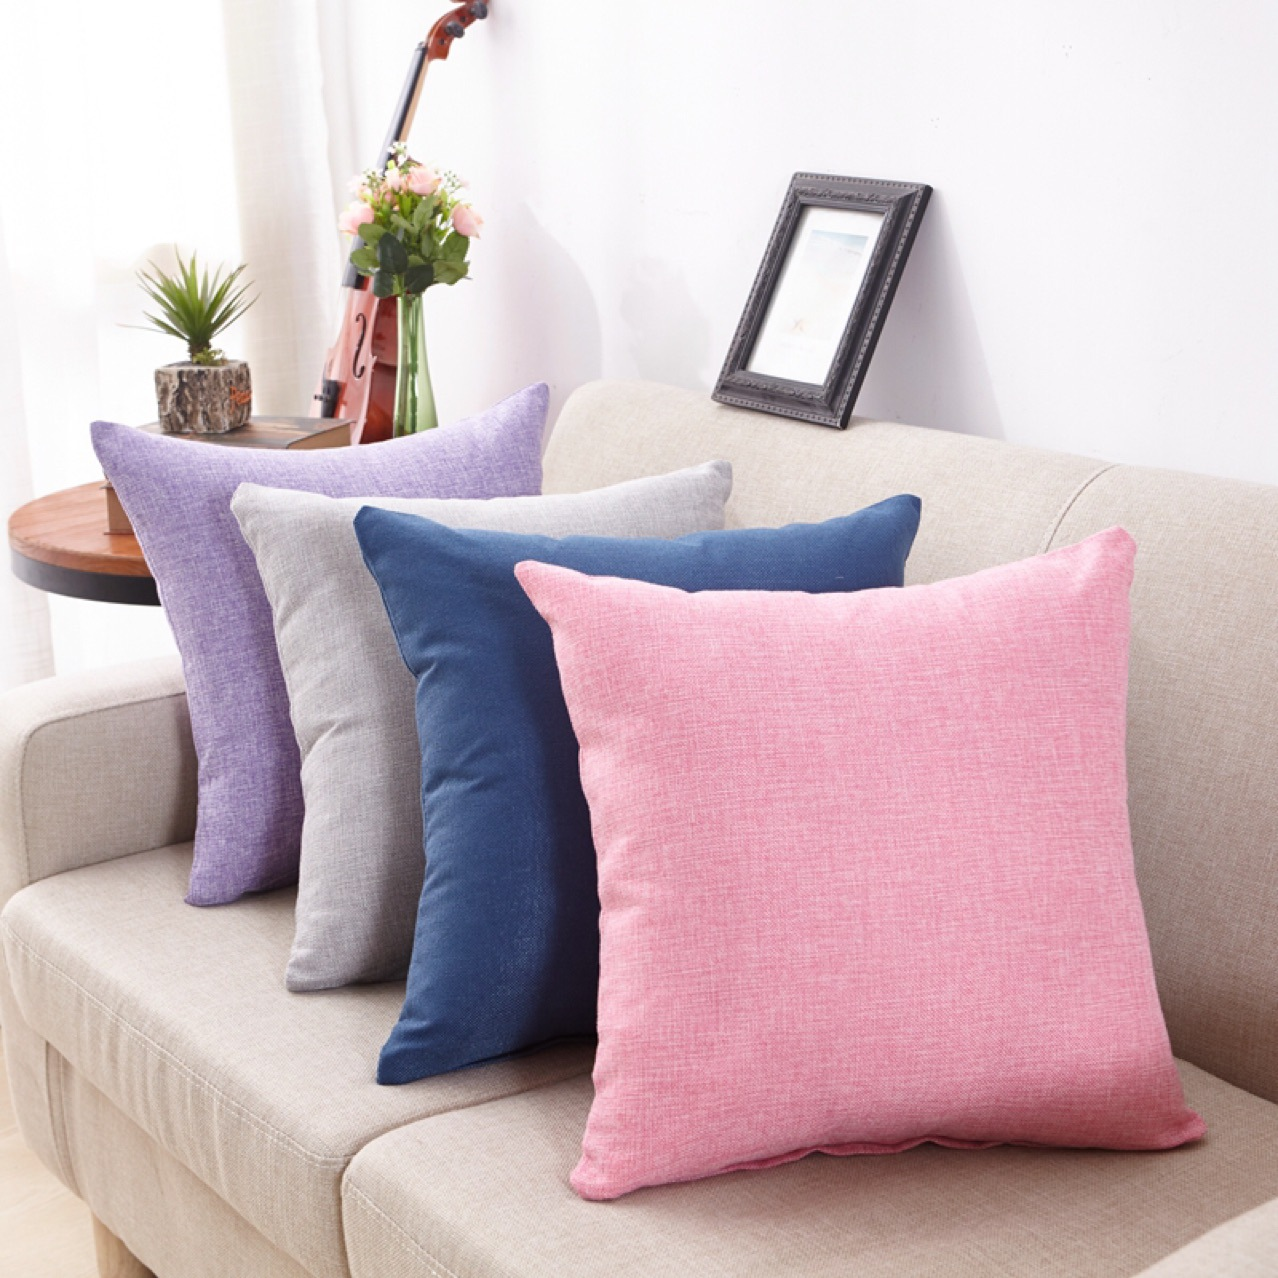 HTB17IFvgTnI8KJjy0Ffq6AdoVXad 45x45cm New Soft Multicolor Choice Tailored Edge Poly Cotton European Cushion Home Decor